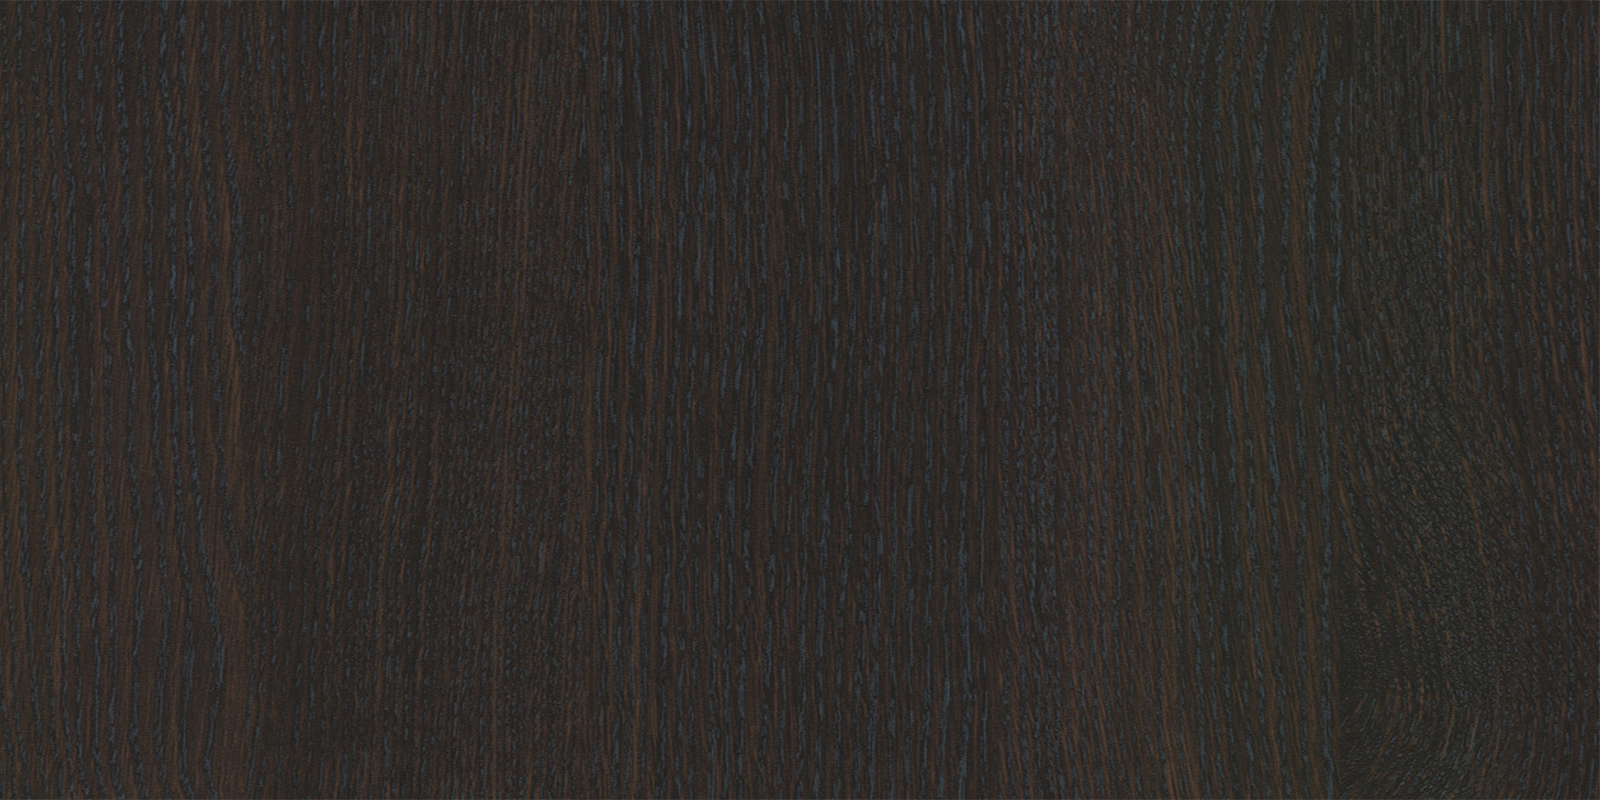 Шкаф-купе двухдверный Манчестер 150 см (дуб феррара/лес)